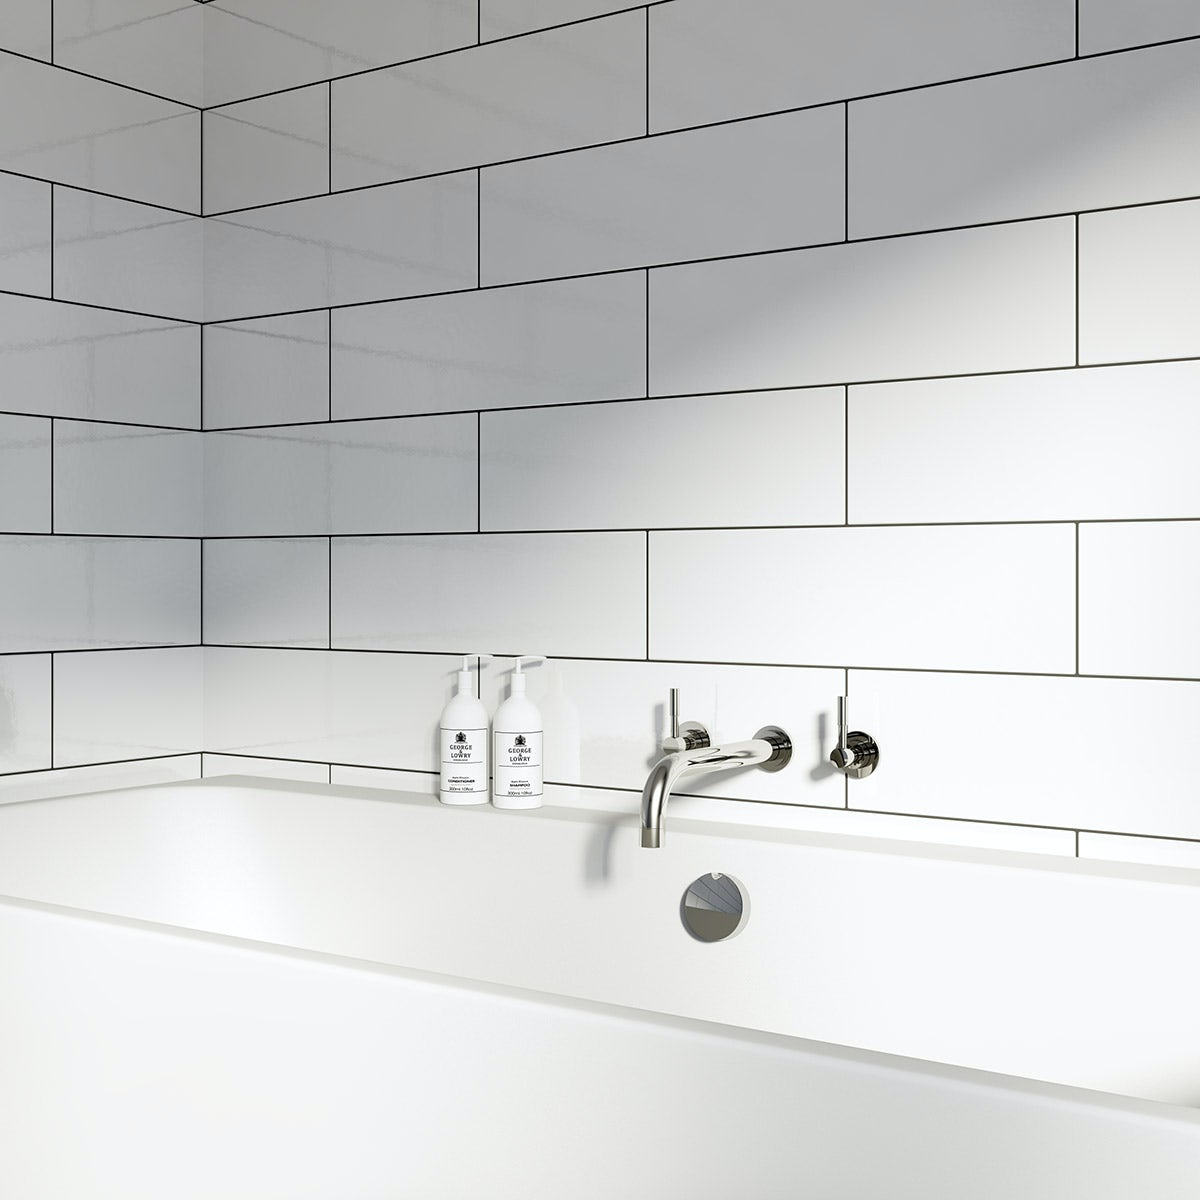 British Ceramic Tile Maxi Metro Pure white gloss tile 148mm x 498mm